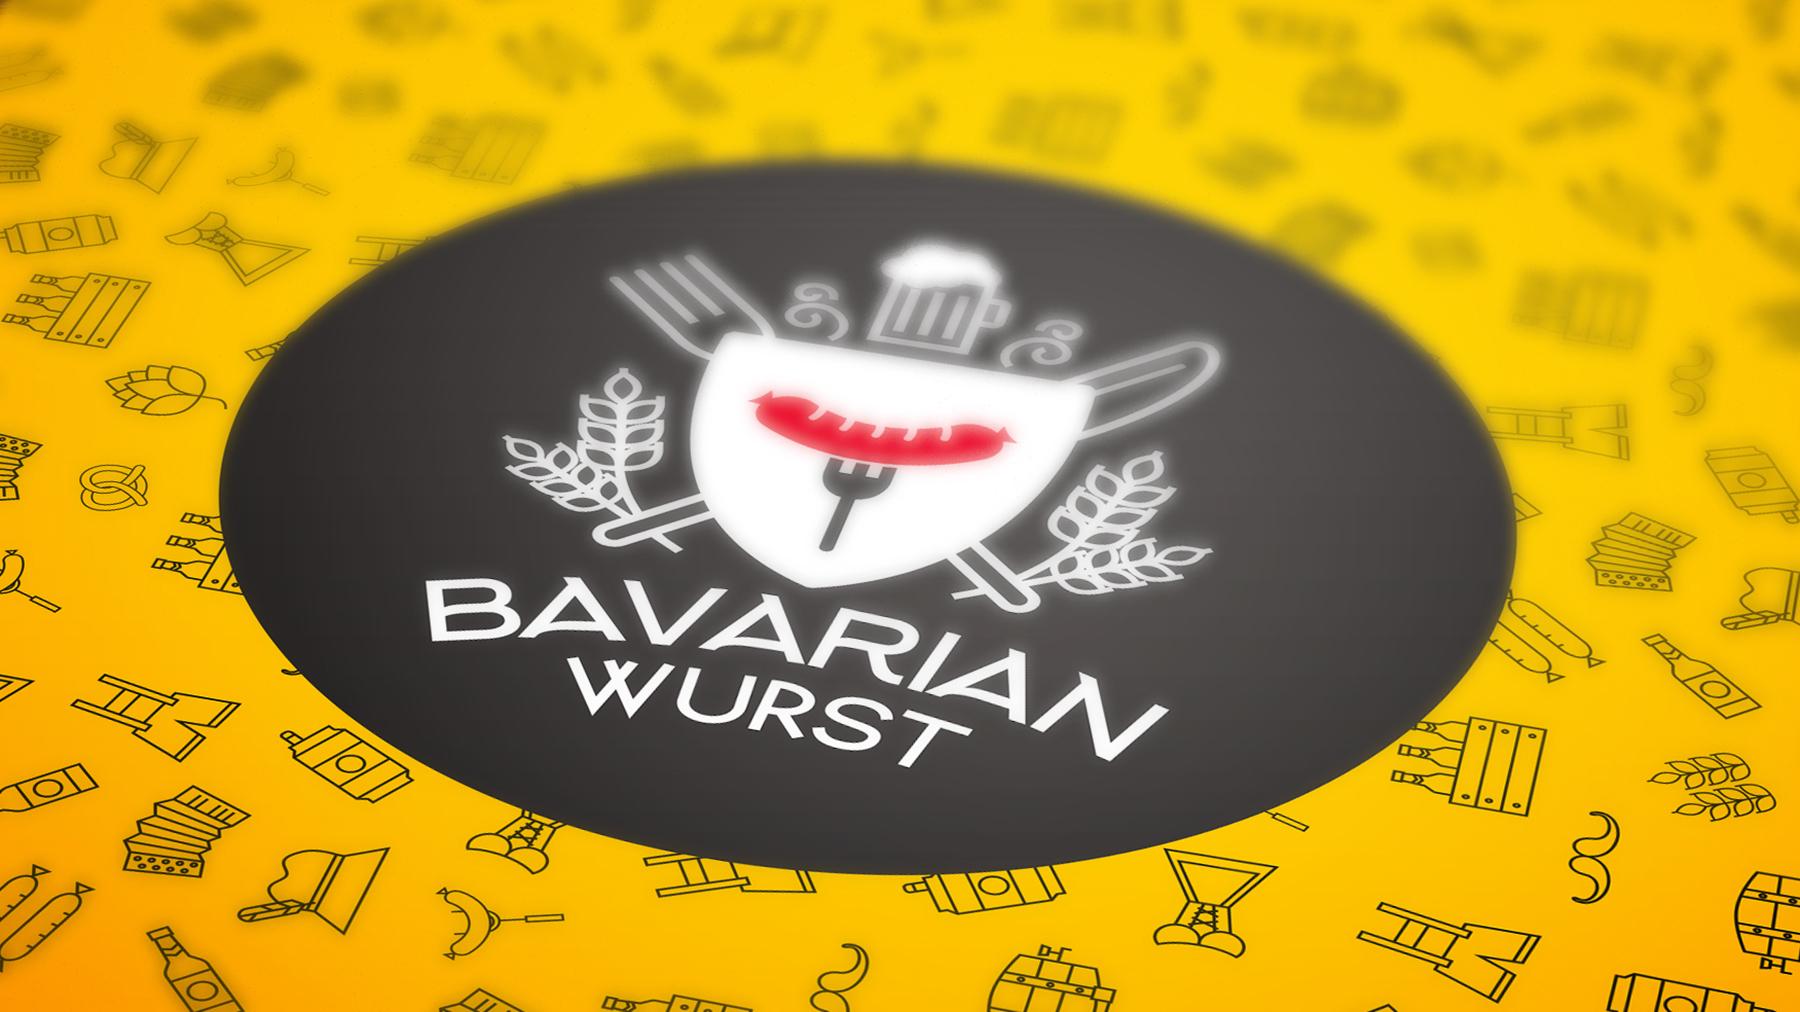 Bavarian Wurst